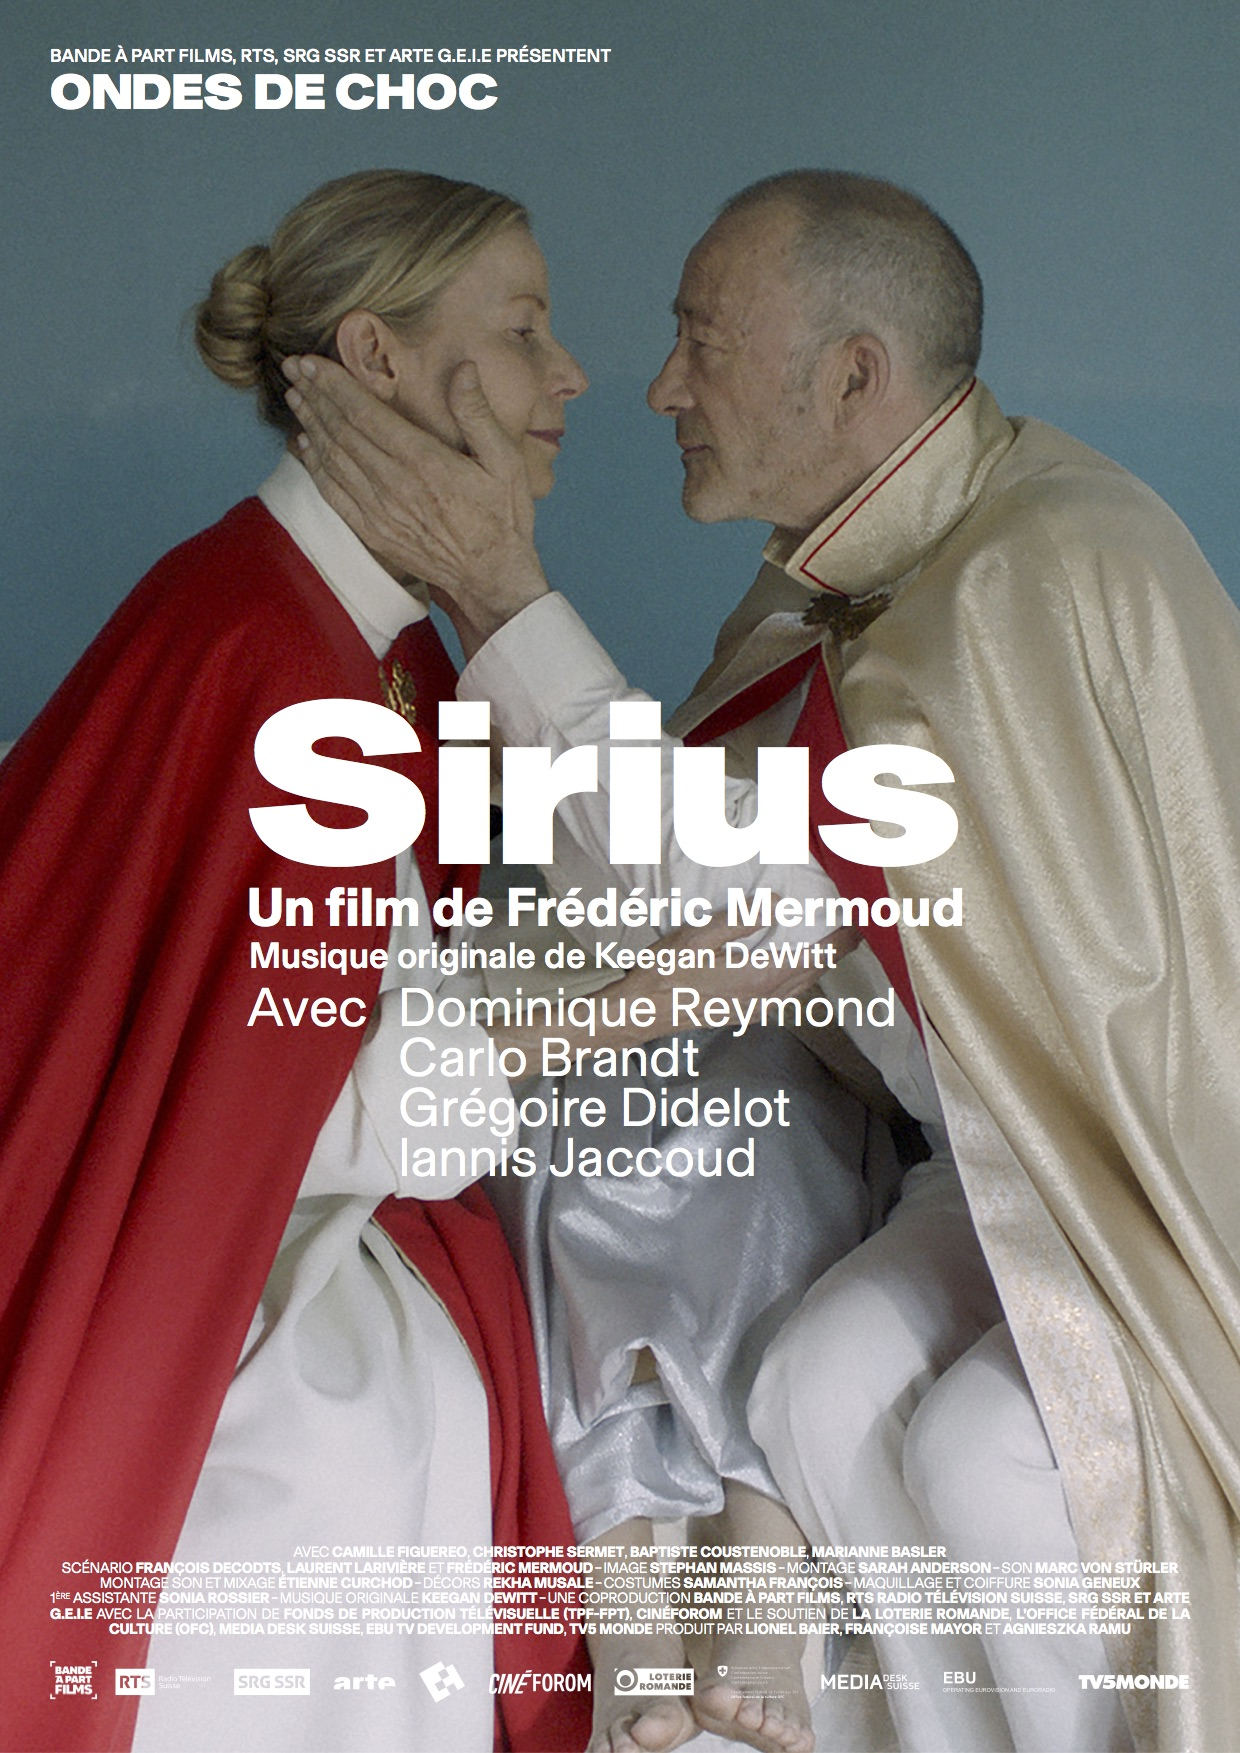 Ondes de choc [2] : Sirius, Mermoud, Frédéric